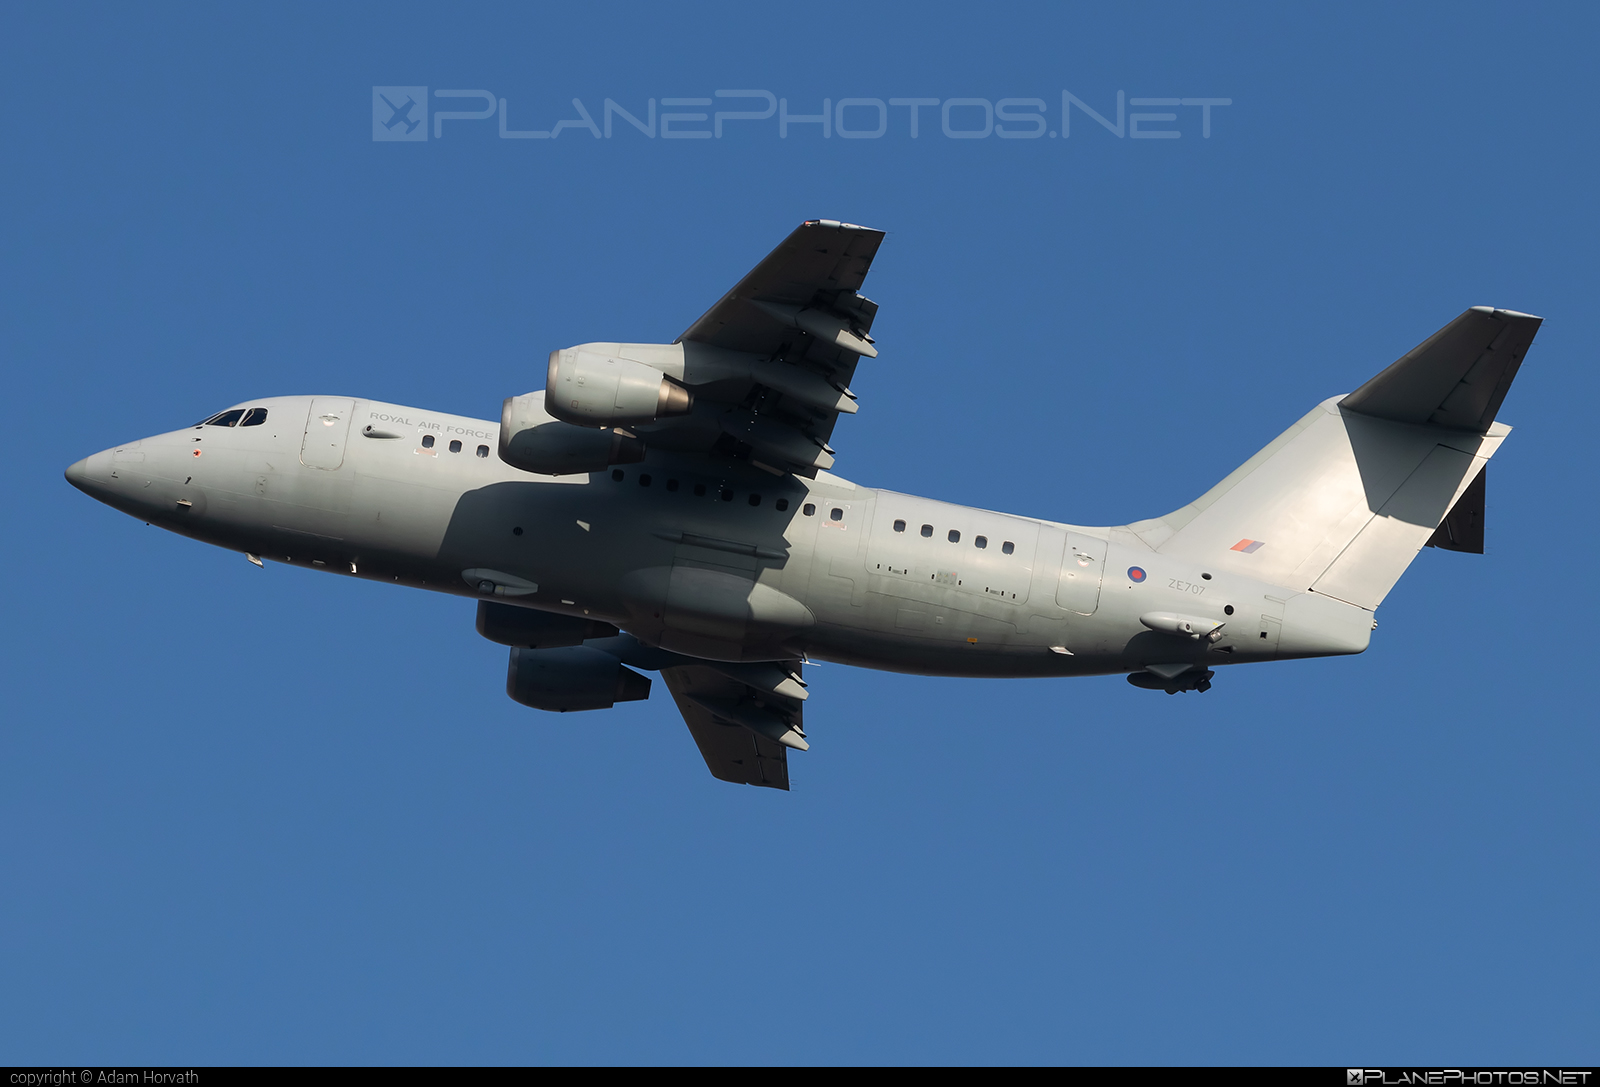 British Aerospace BAe 146-200 - ZE707 operated by Royal Air Force (RAF) #bae146 #bae146200 #britishaerospace #raf #royalairforce